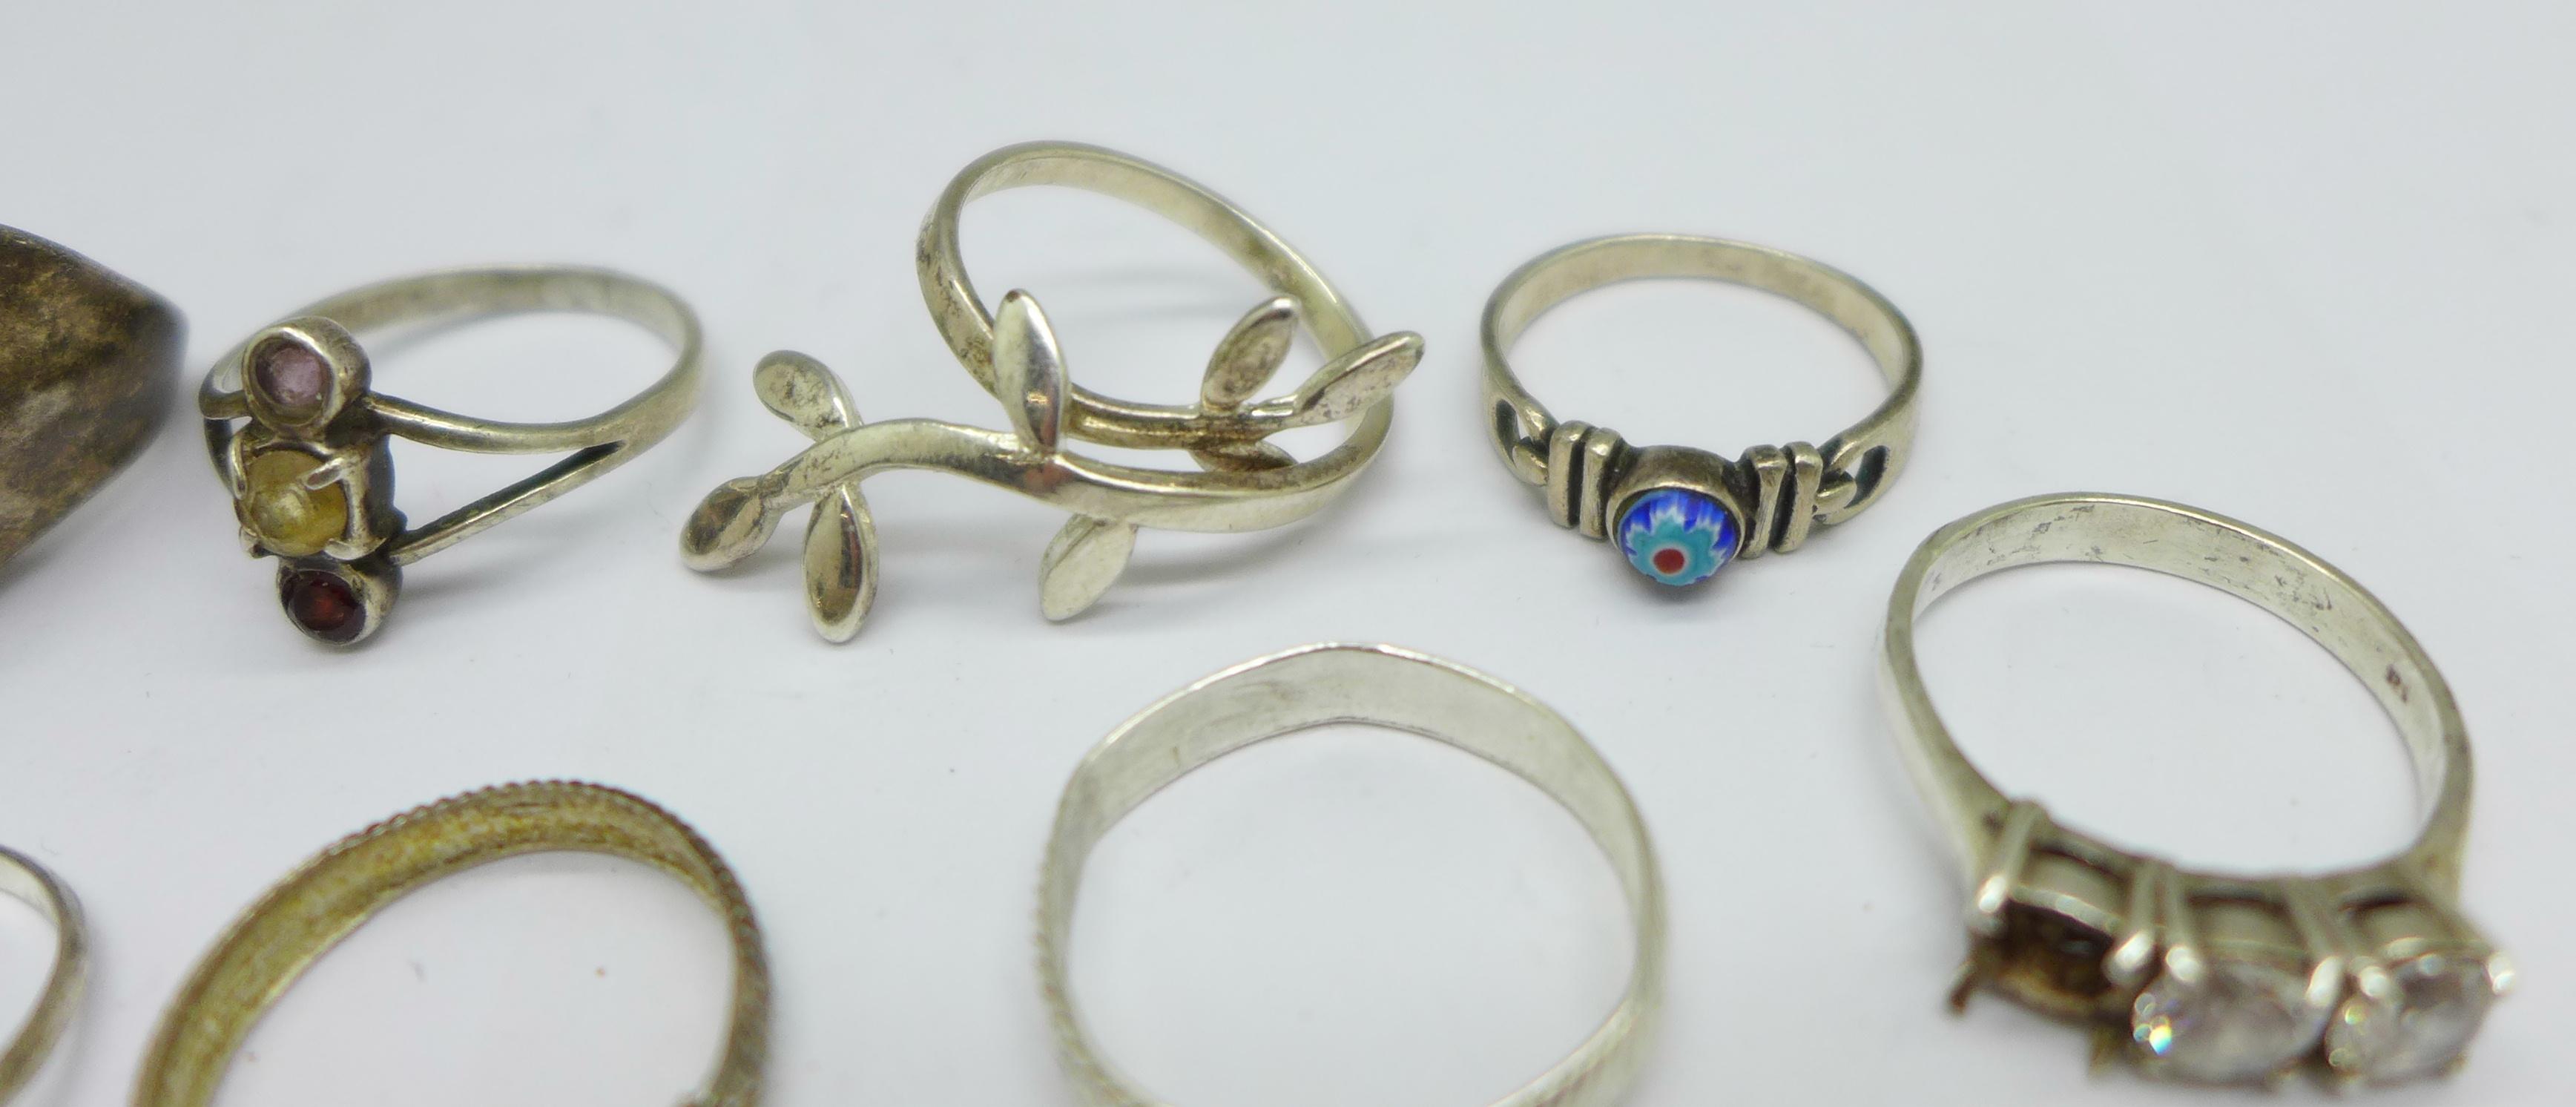 Ten silver rings, 28g - Image 5 of 5